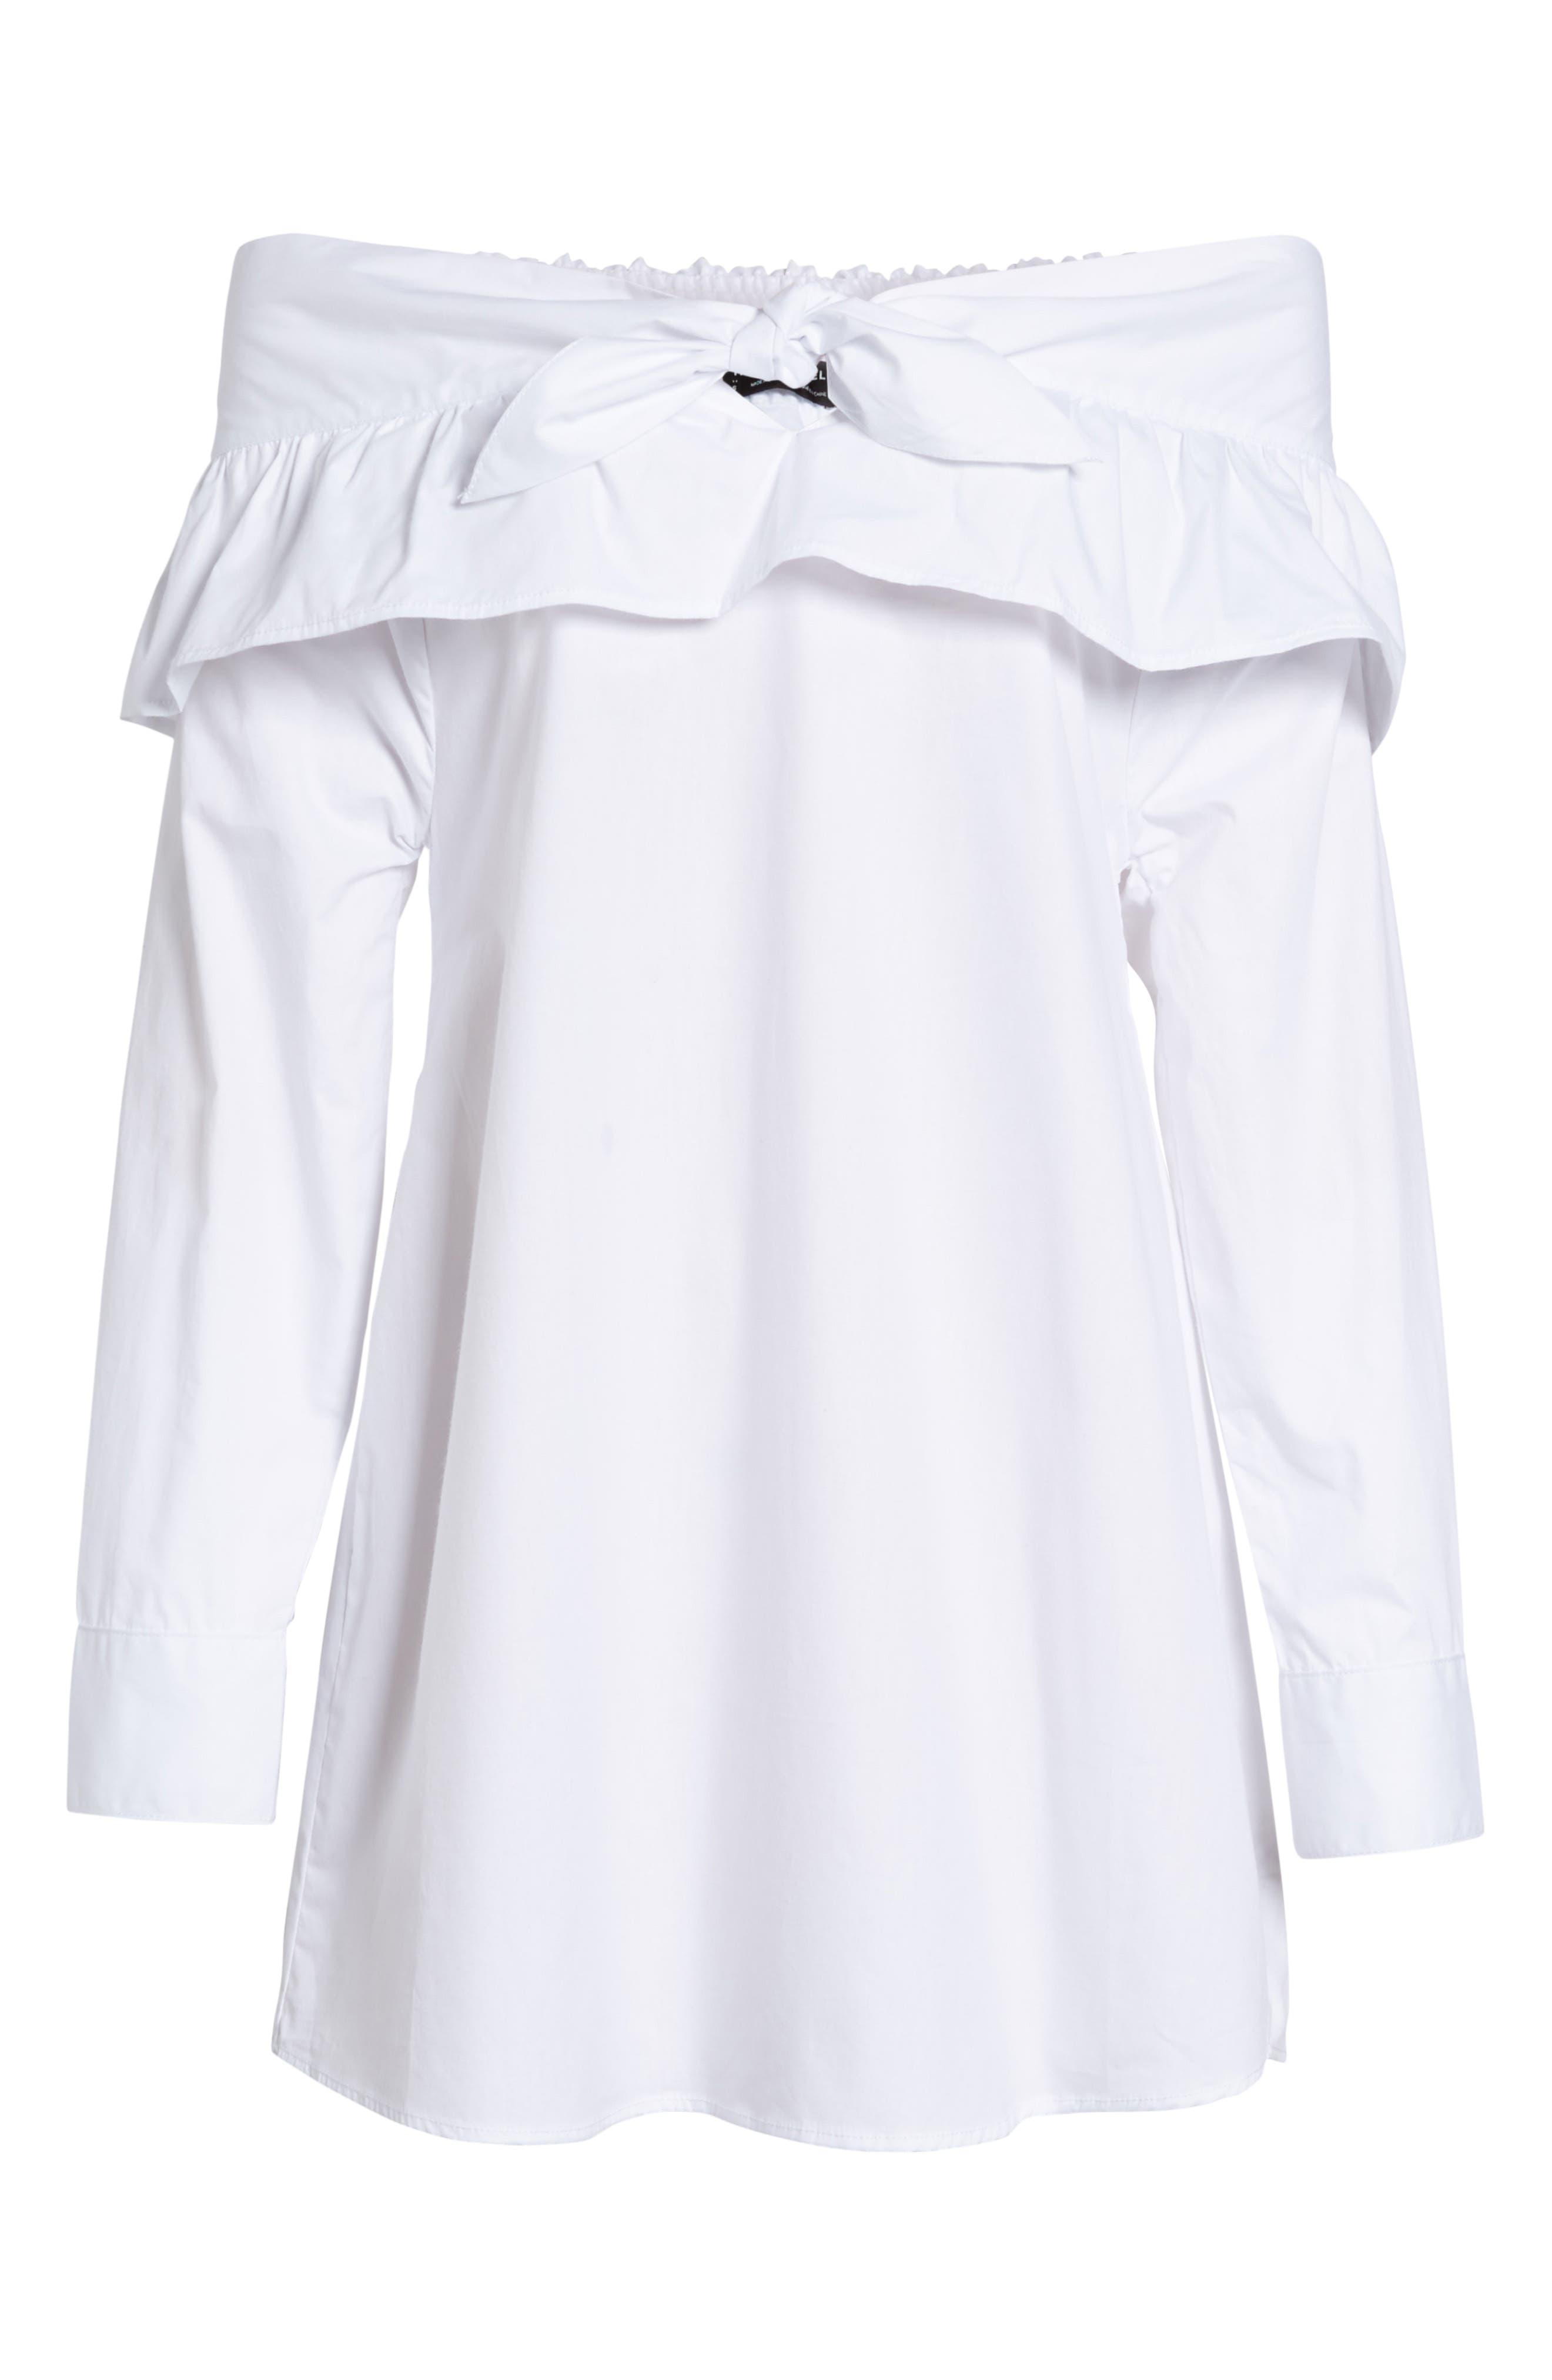 Paper Planes Off the Shoulder Dress,                             Alternate thumbnail 7, color,                             White